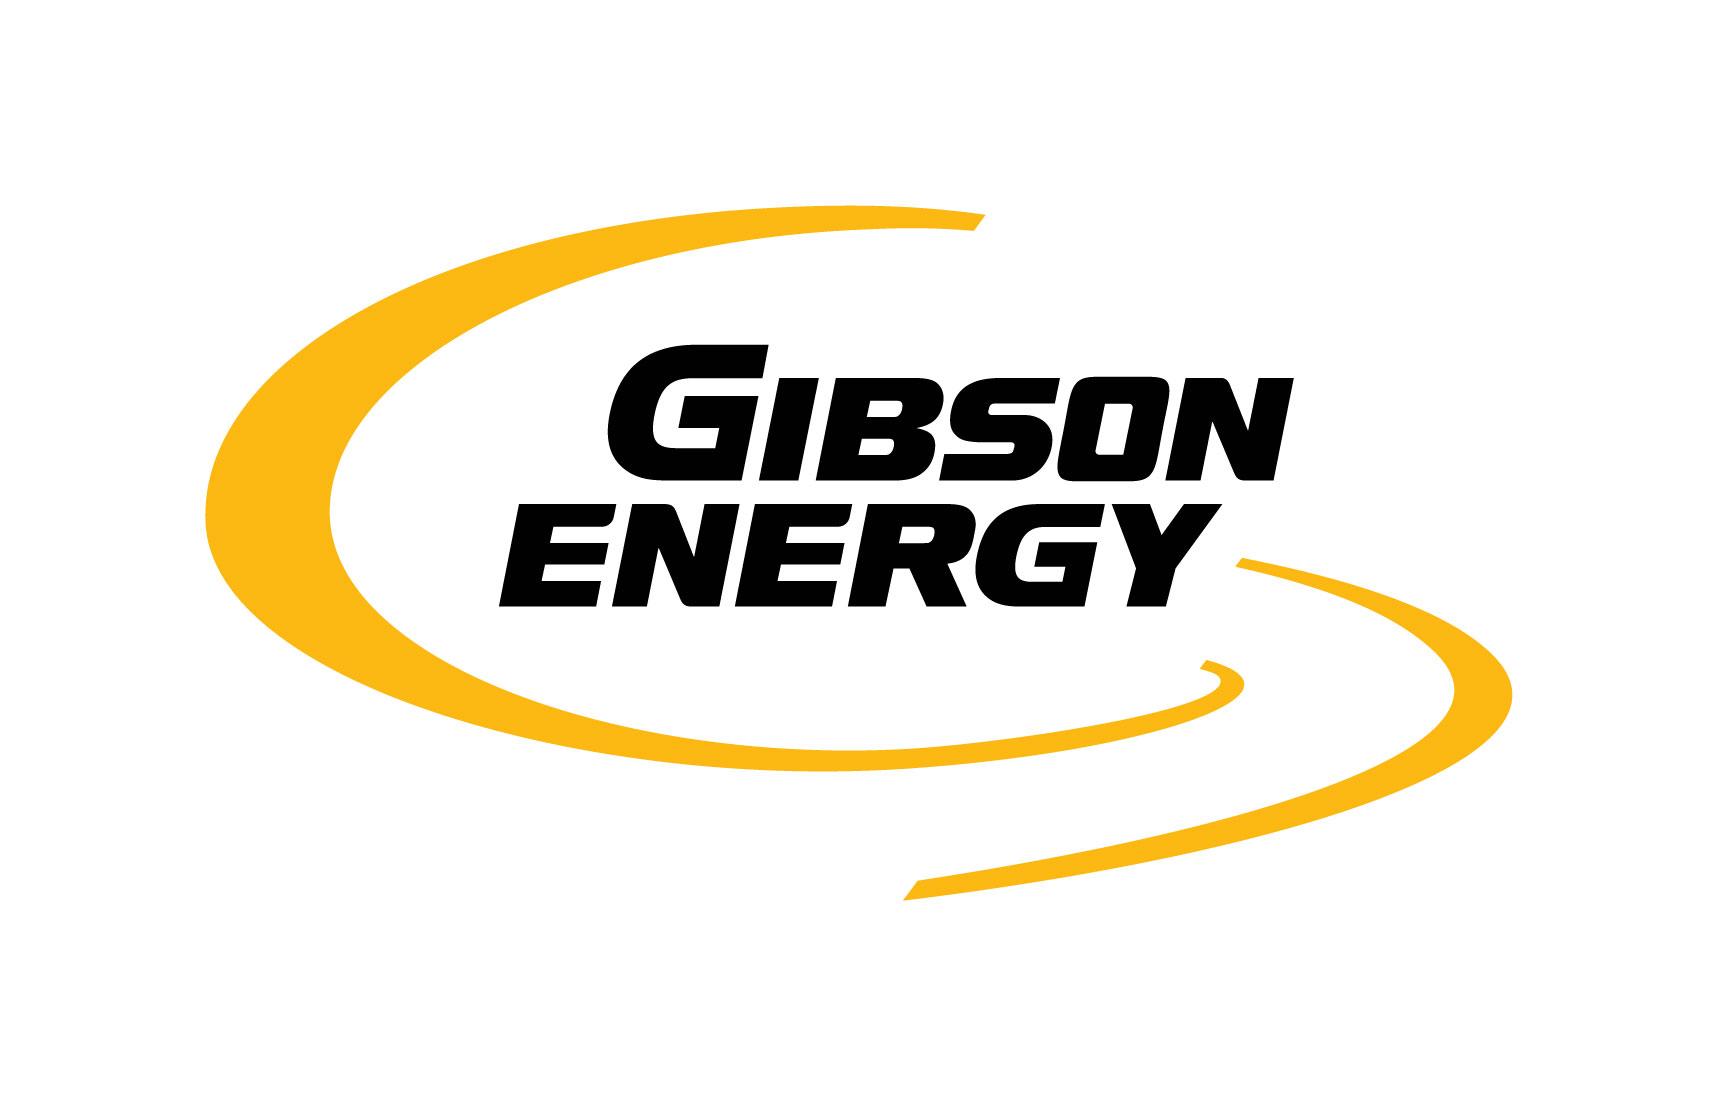 Gibson Energy Announces Normal Course Issuer Bid